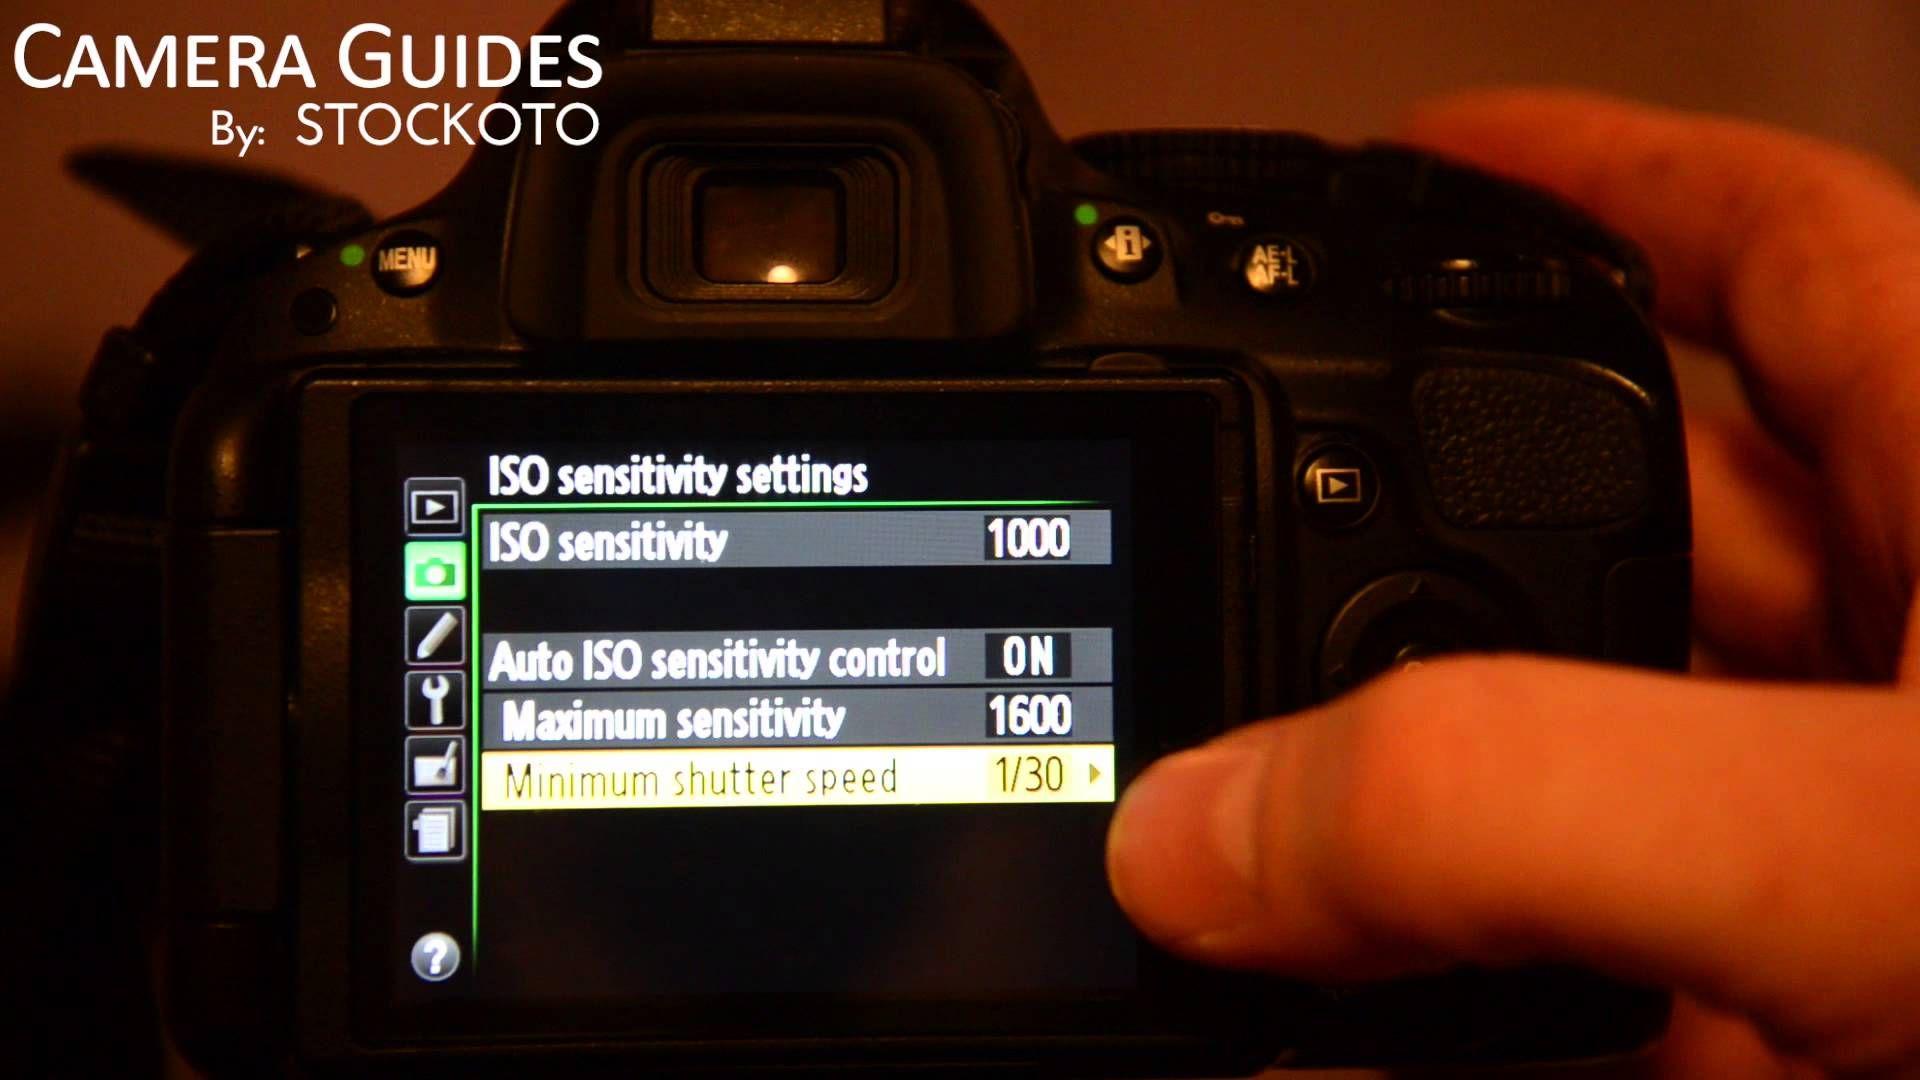 how to set iso sensitivity on a nikon d5100 d5200 d5300 rh pinterest com Shot with Nikon D5100 nikon d5100 manual video mode